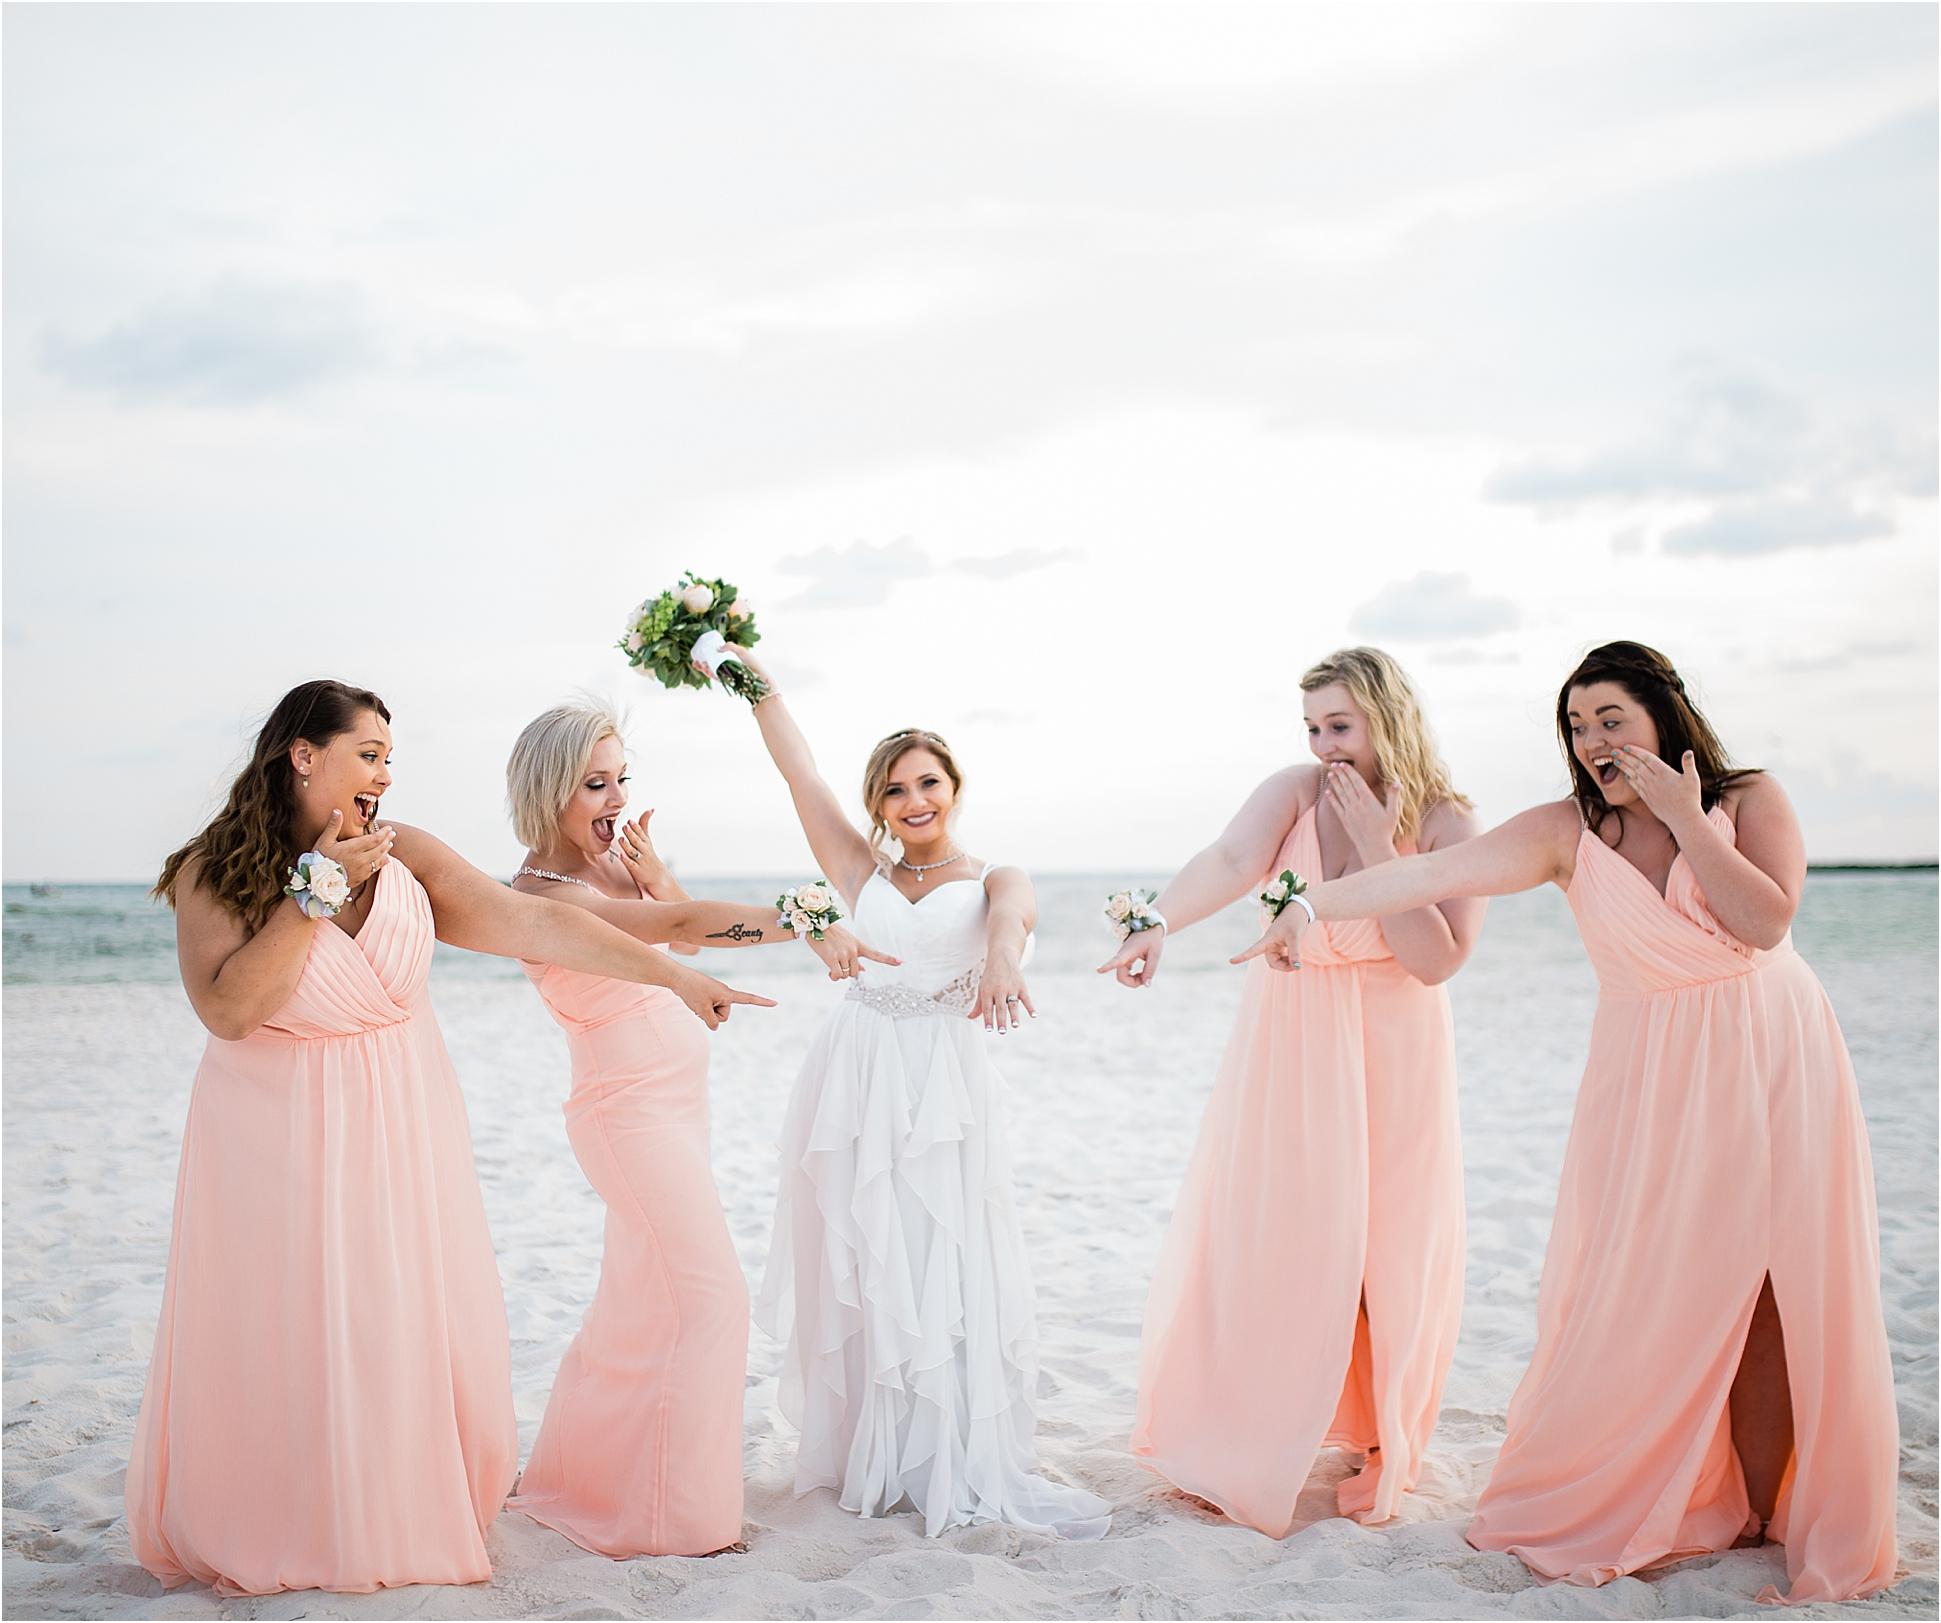 Bridesmaids Wedding Dresses